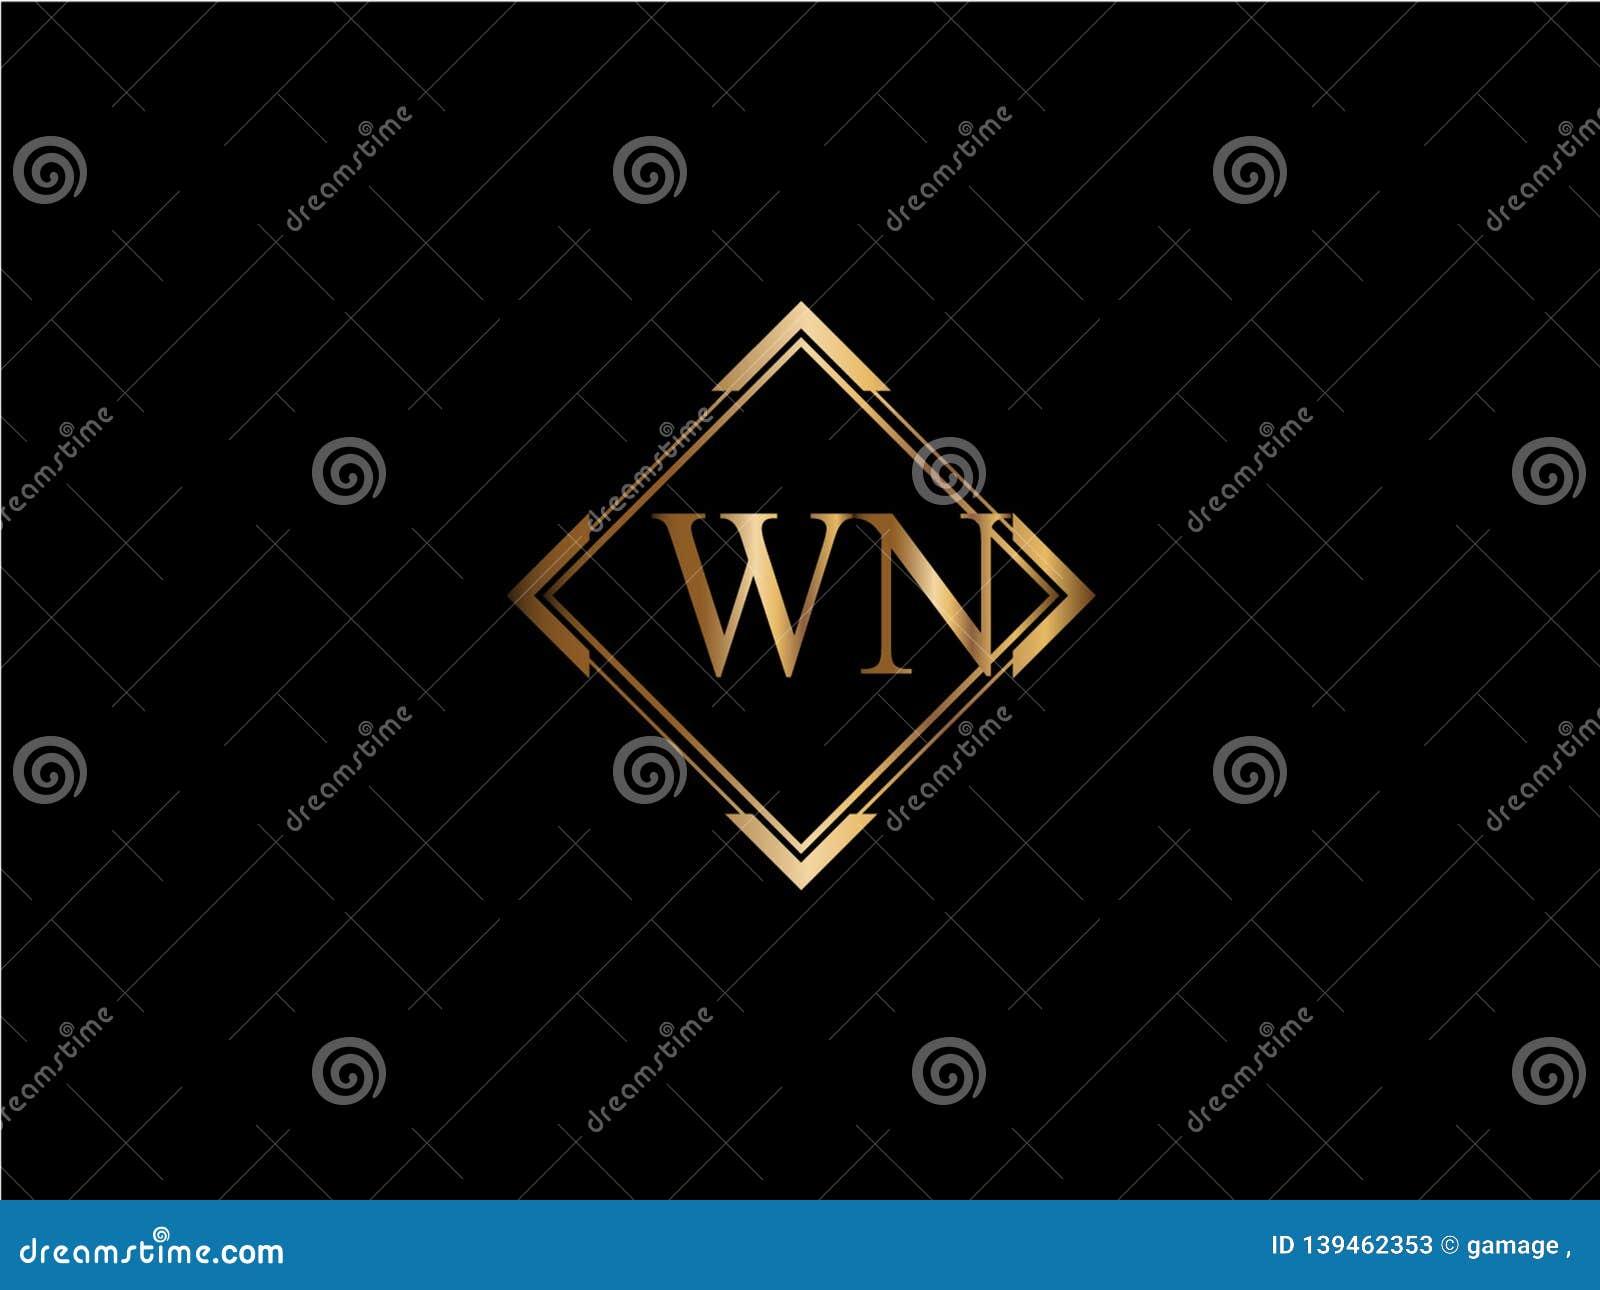 WN-Anfangsdiamantform Goldfarbe neuerer Logo Design